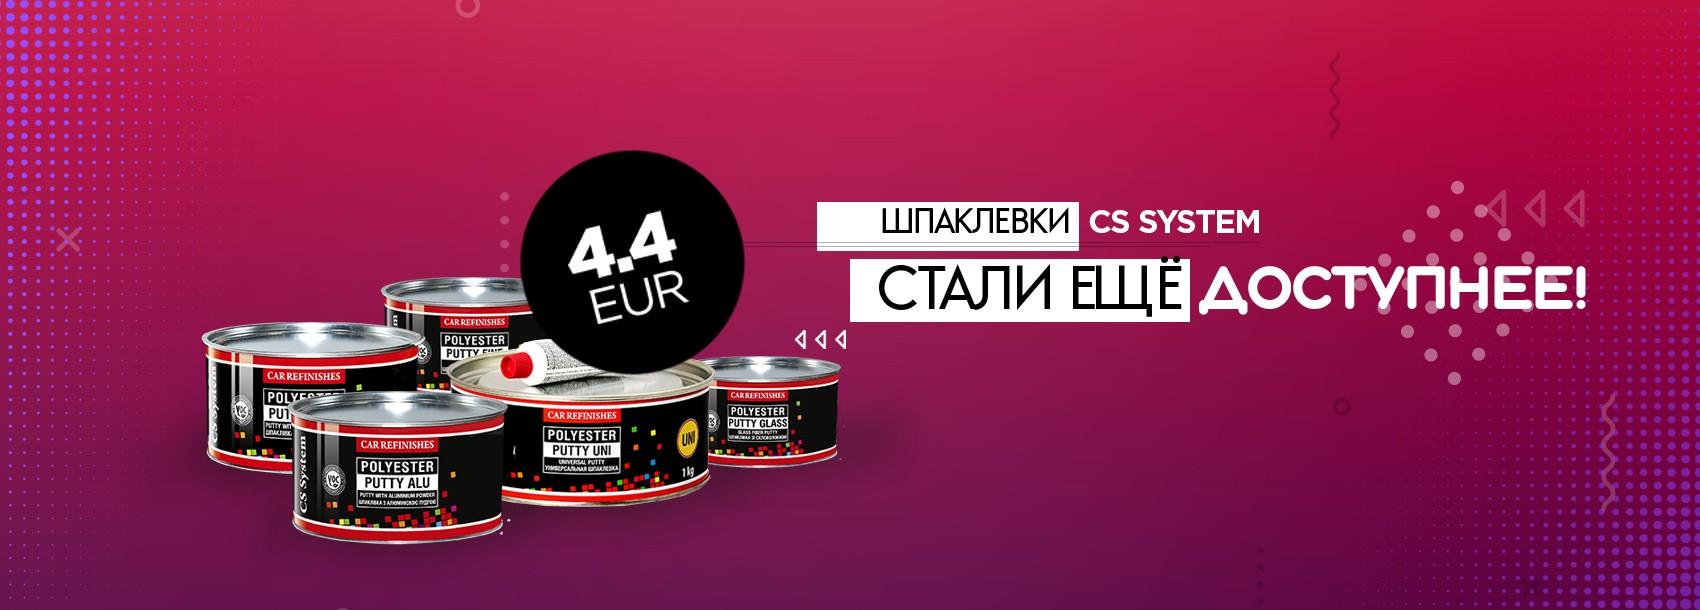 Специальная цена на шпаклевки CS System – 4.4 EUR